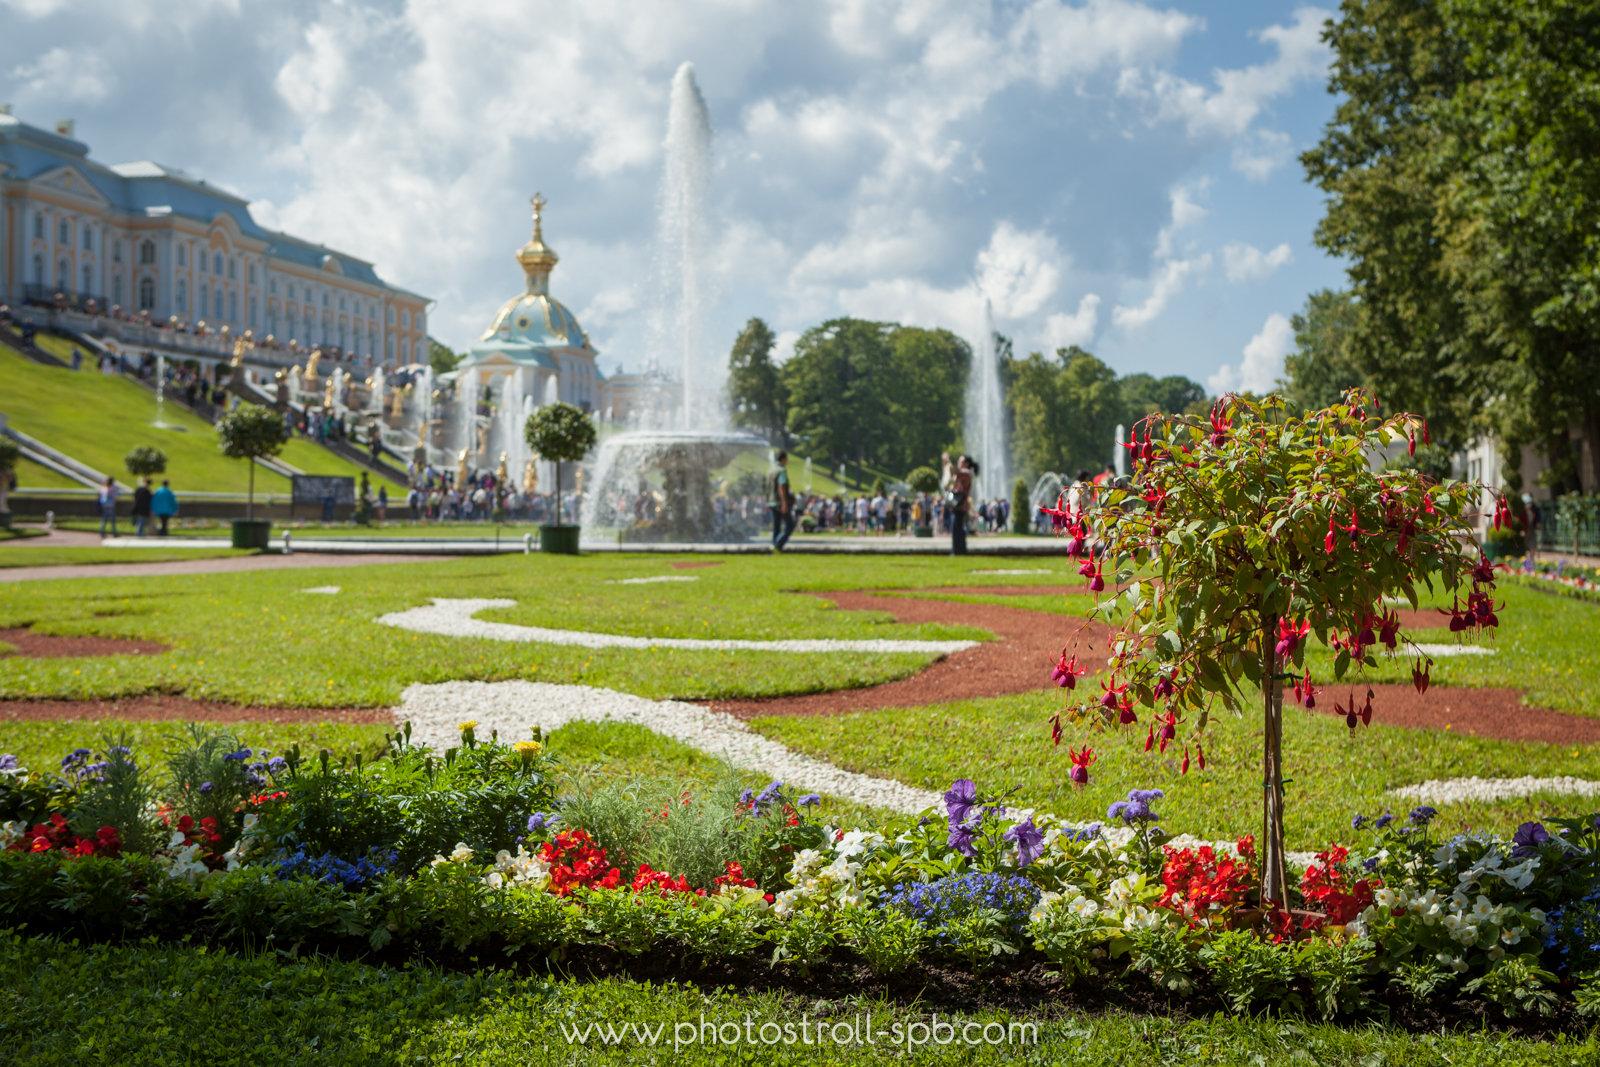 PHOTOstroll in Peterhof